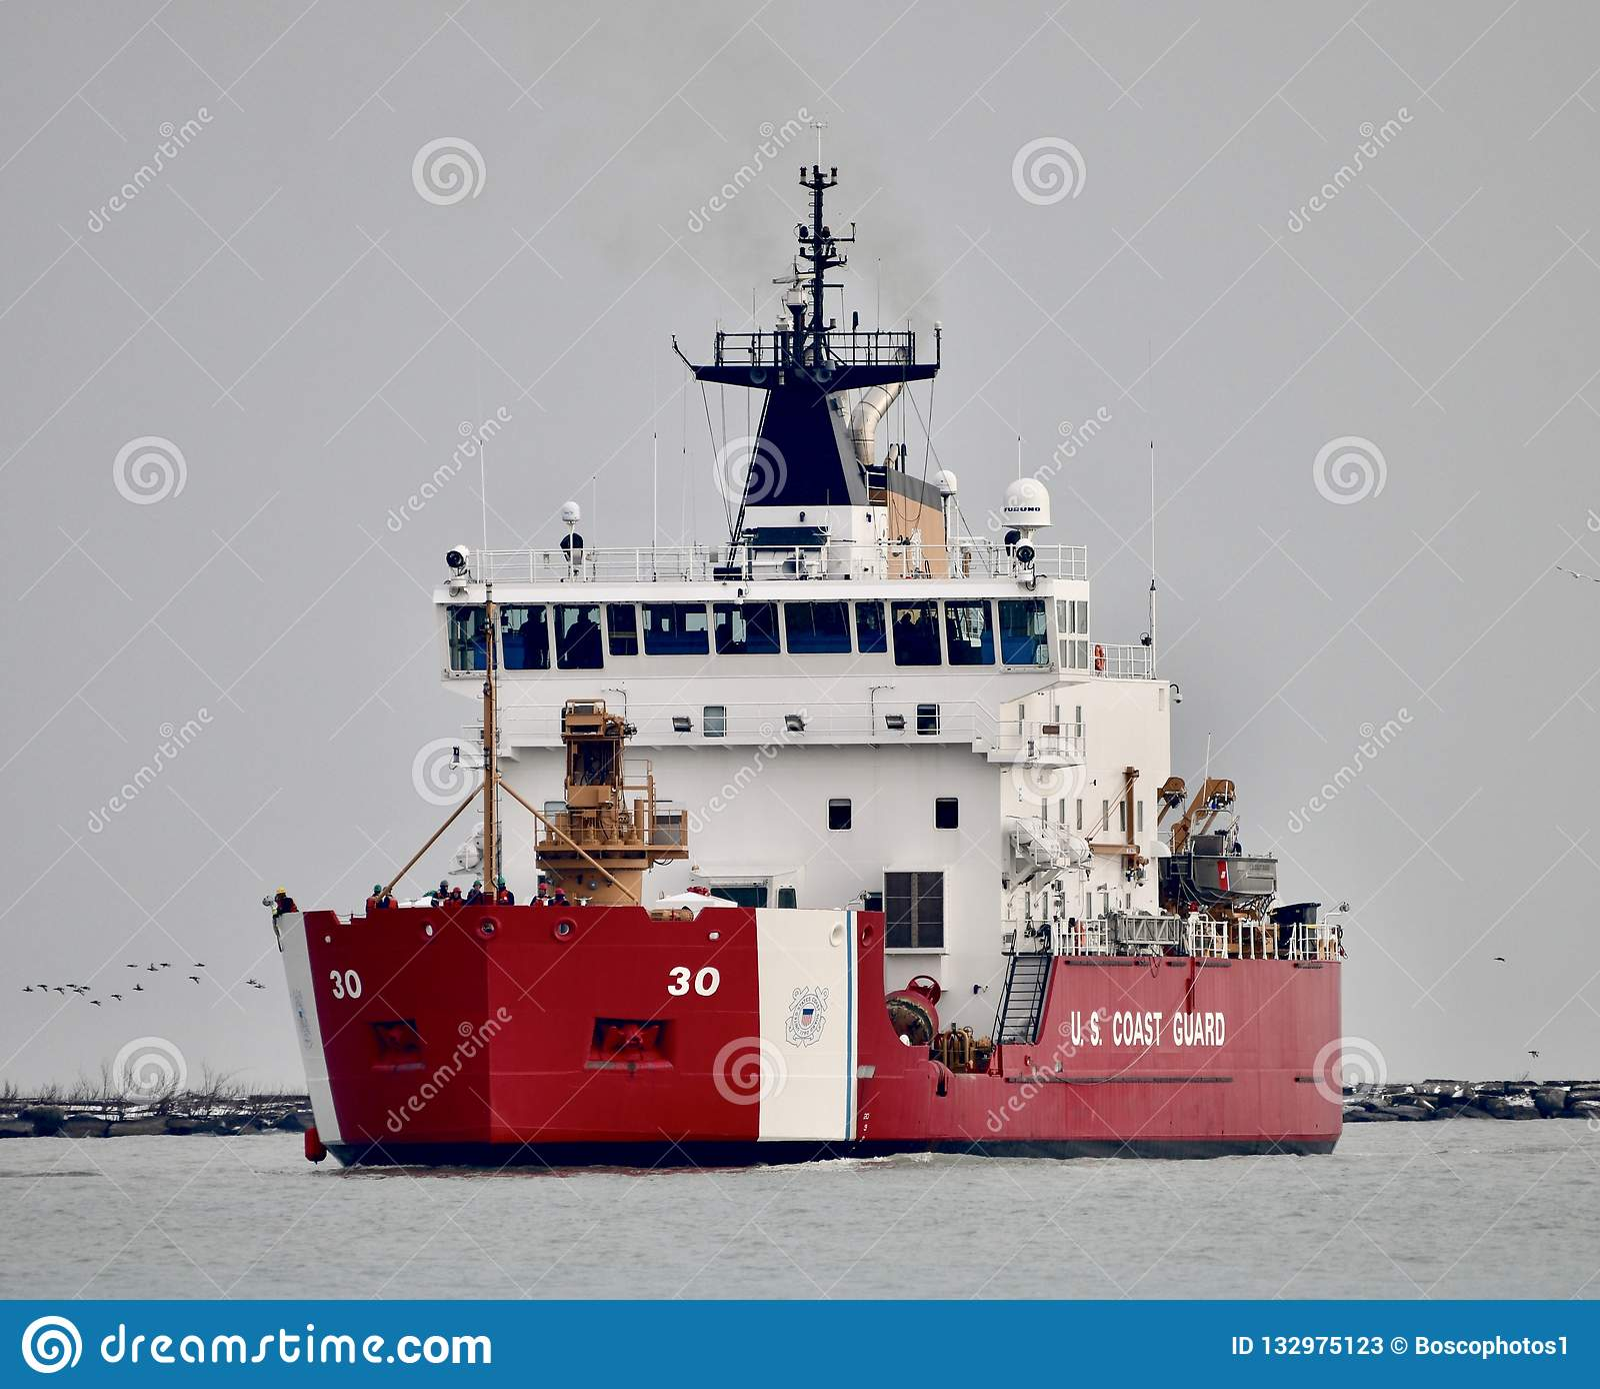 The U S Coast Guard Cutter Mackinaw Editorial Stock Photo Image